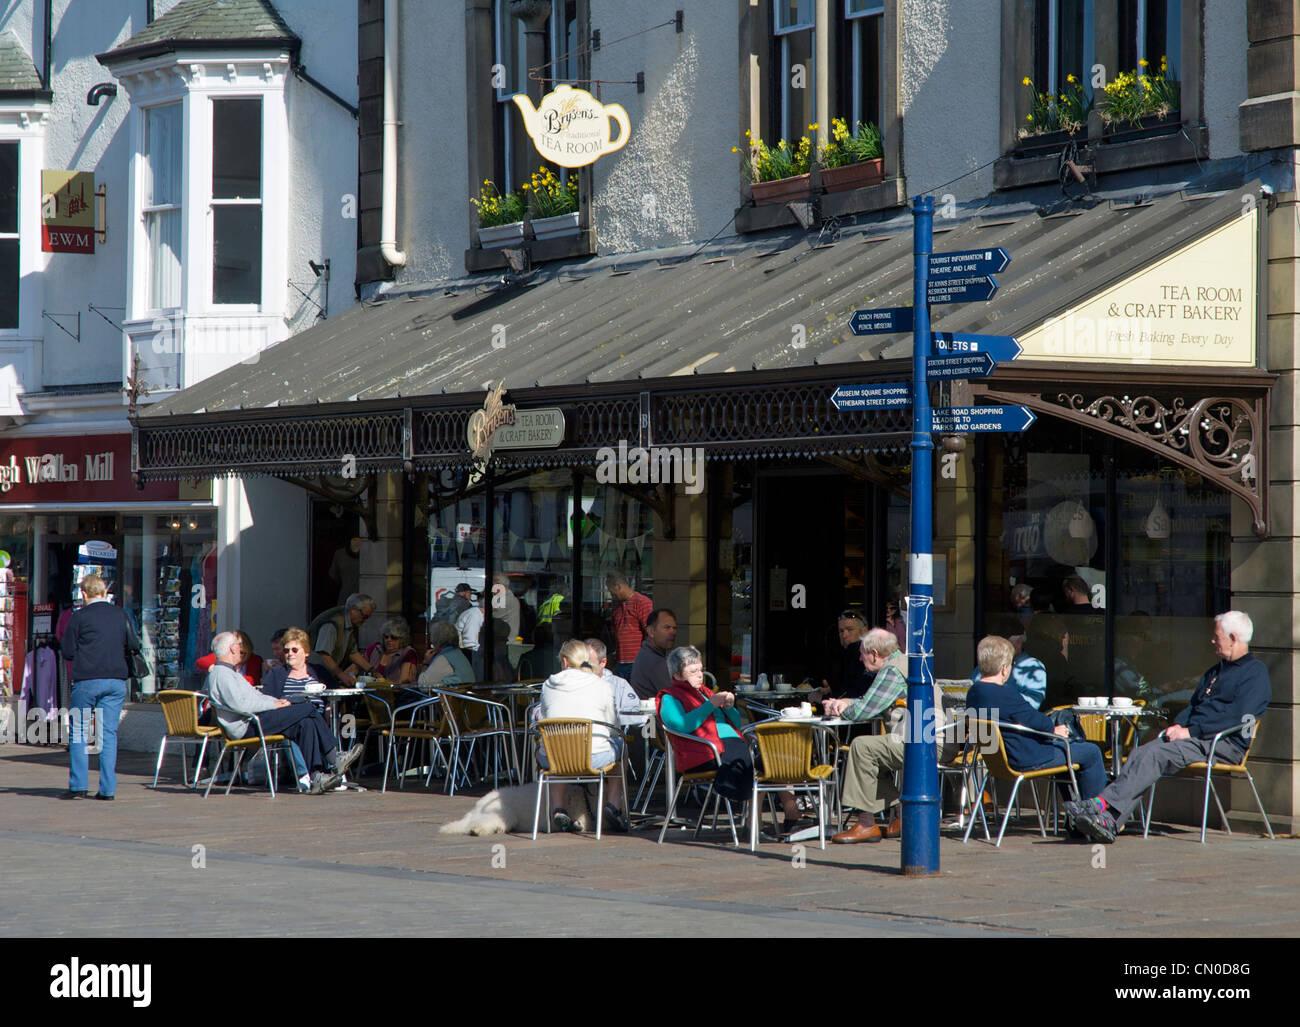 Bryson's Tea Room & Craft Bakery, Market Place, Keswick, Lake District National Park, Cumbria, England UK - Stock Image